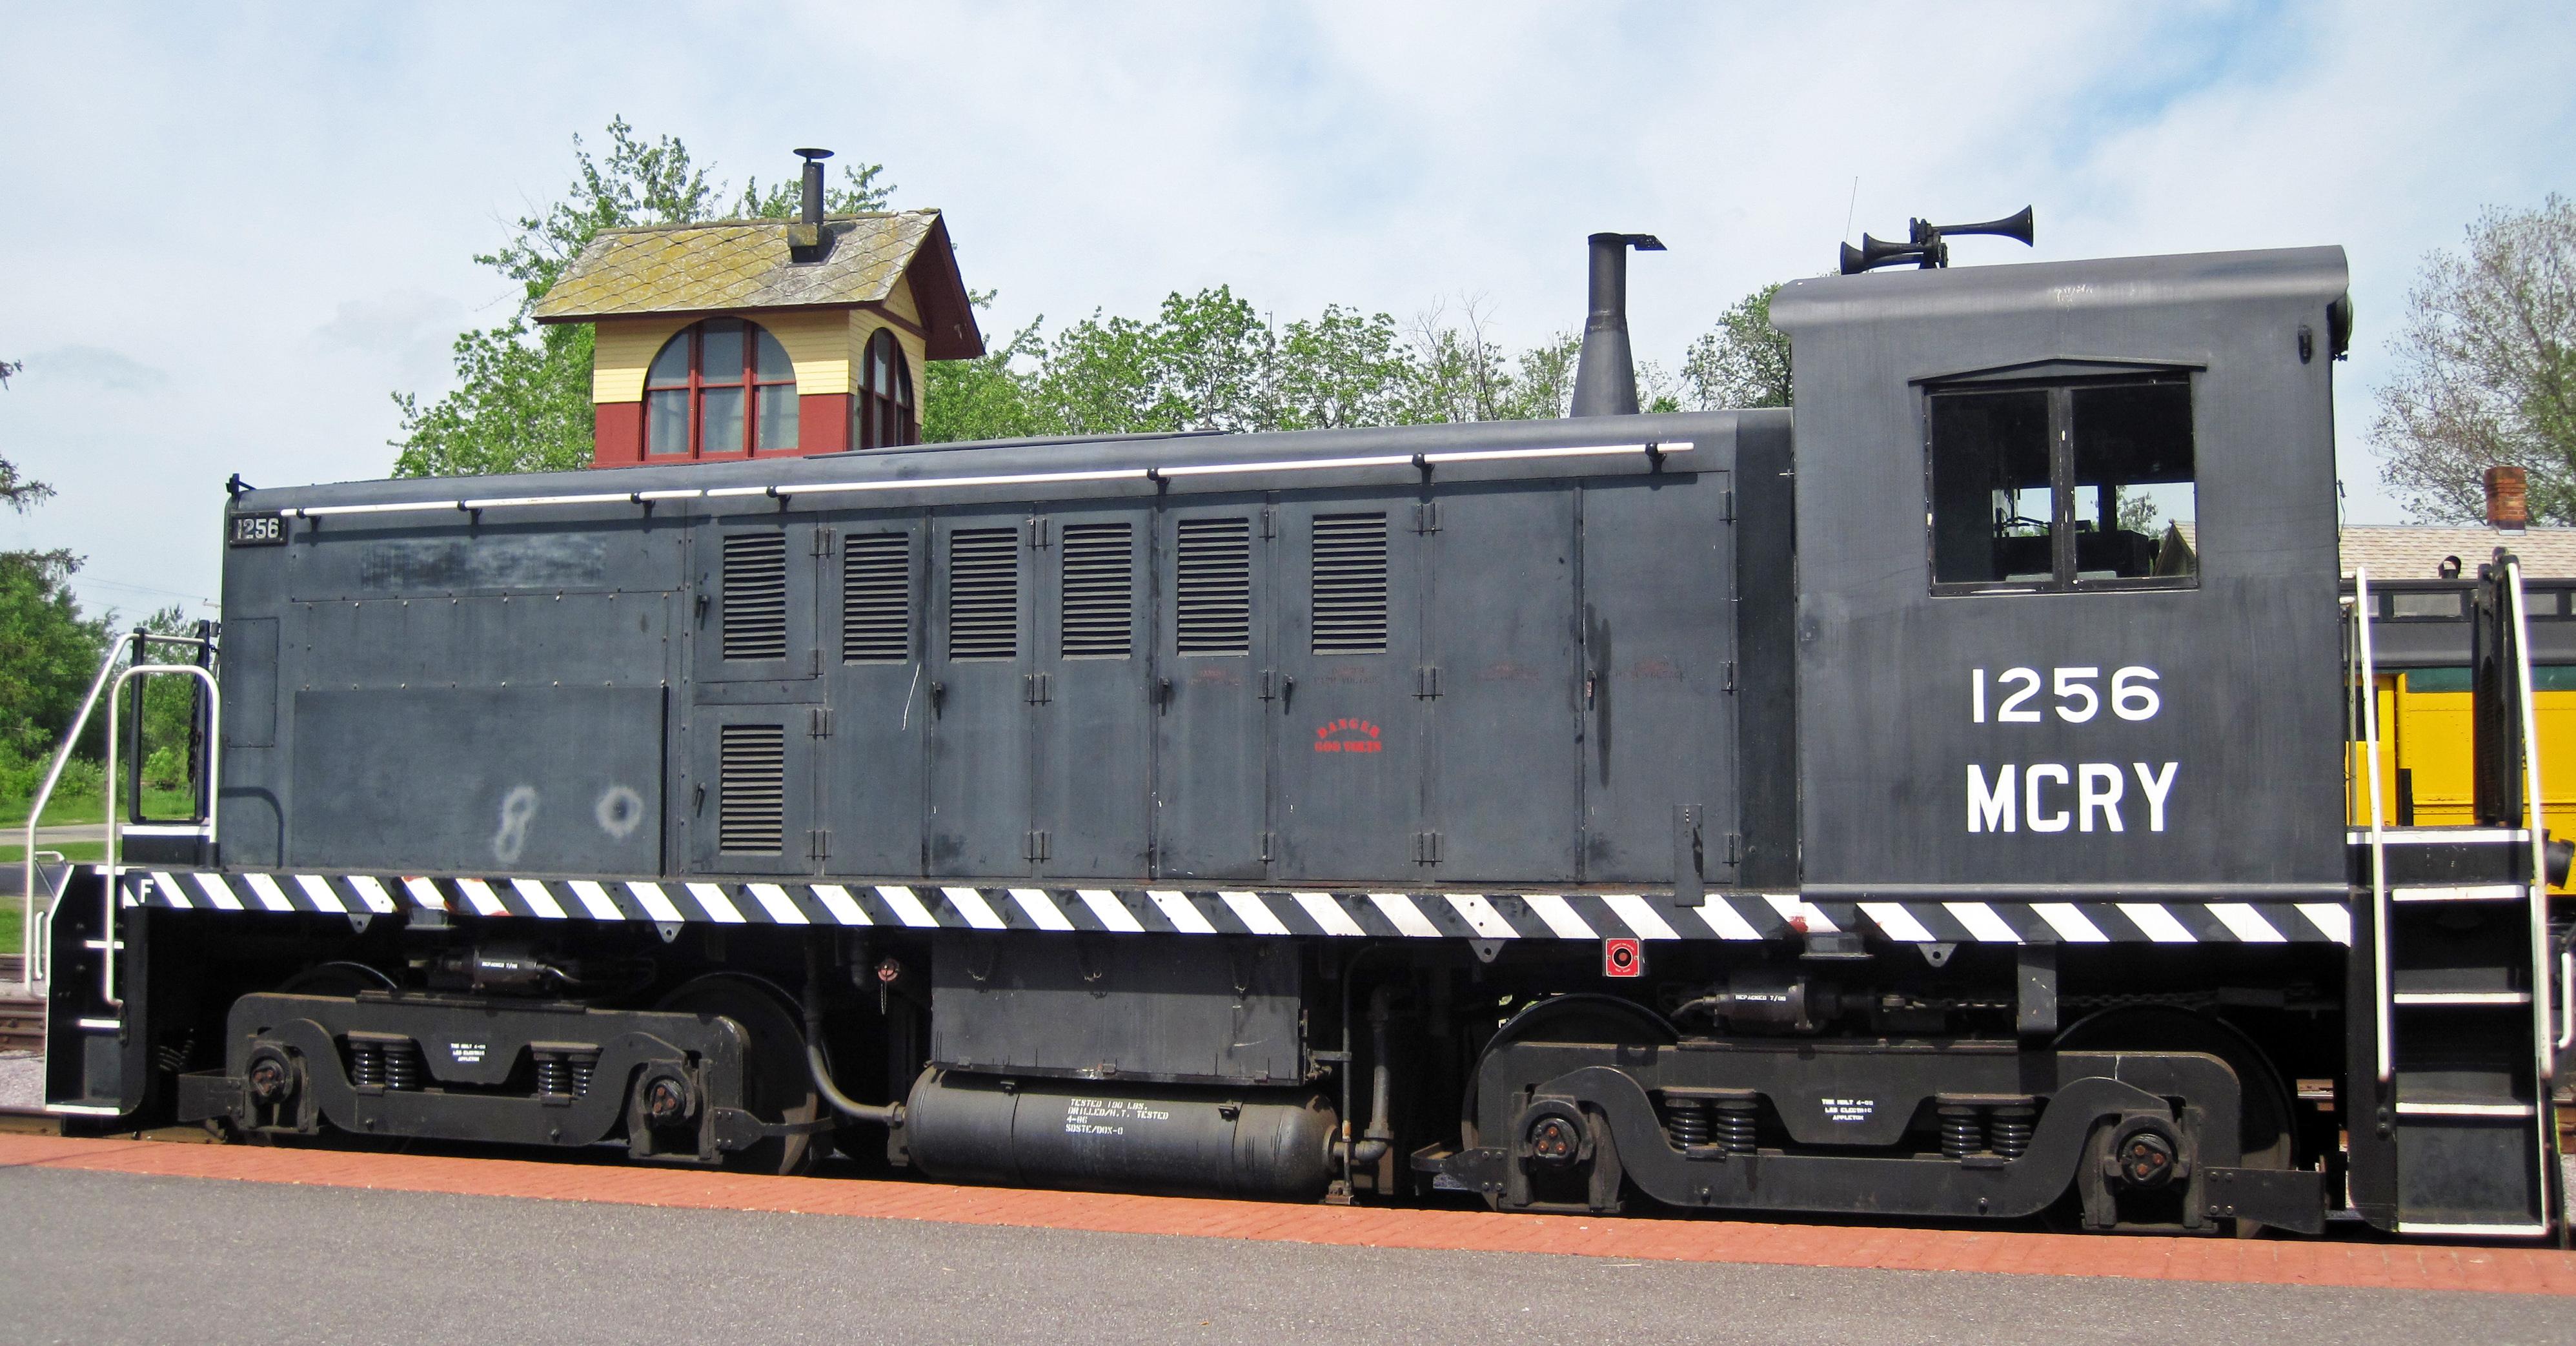 file mid continent railway 1256 diesel locomotive baldwin rs 4 tc rh commons wikimedia org Encevac with Havlogen TC 4 SC TC 4